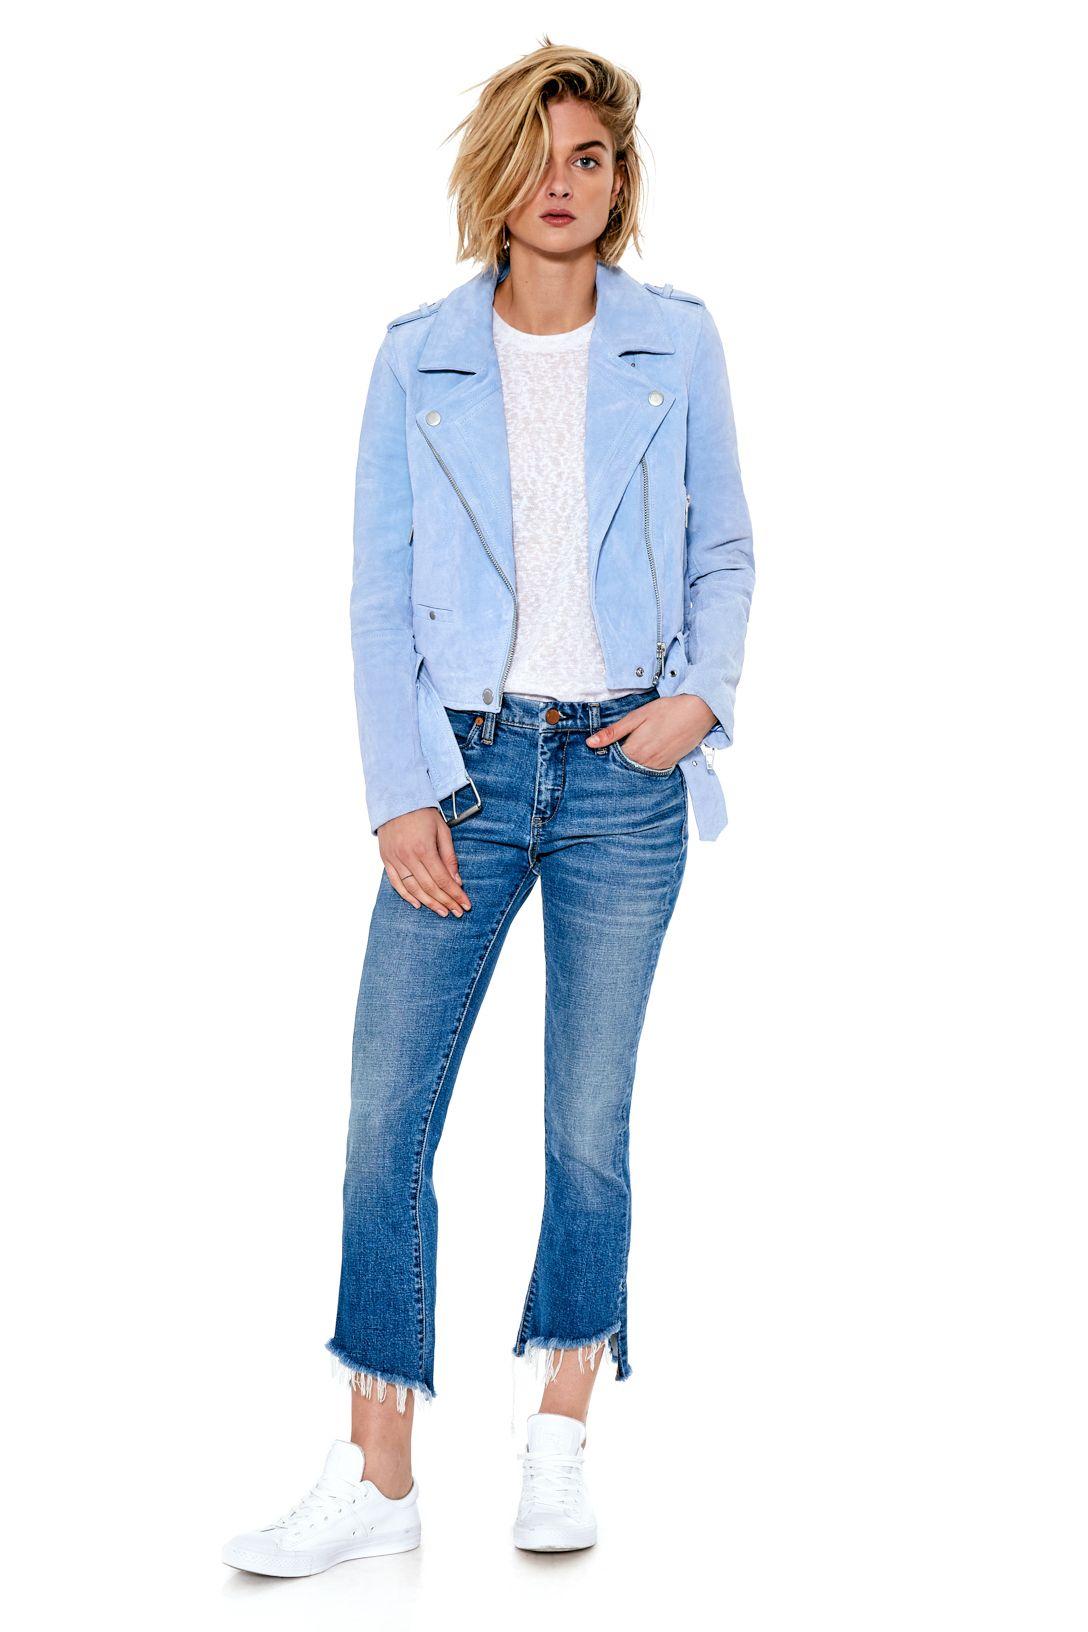 Sky Blue Suede Jacket Jackets, Blue suede jacket